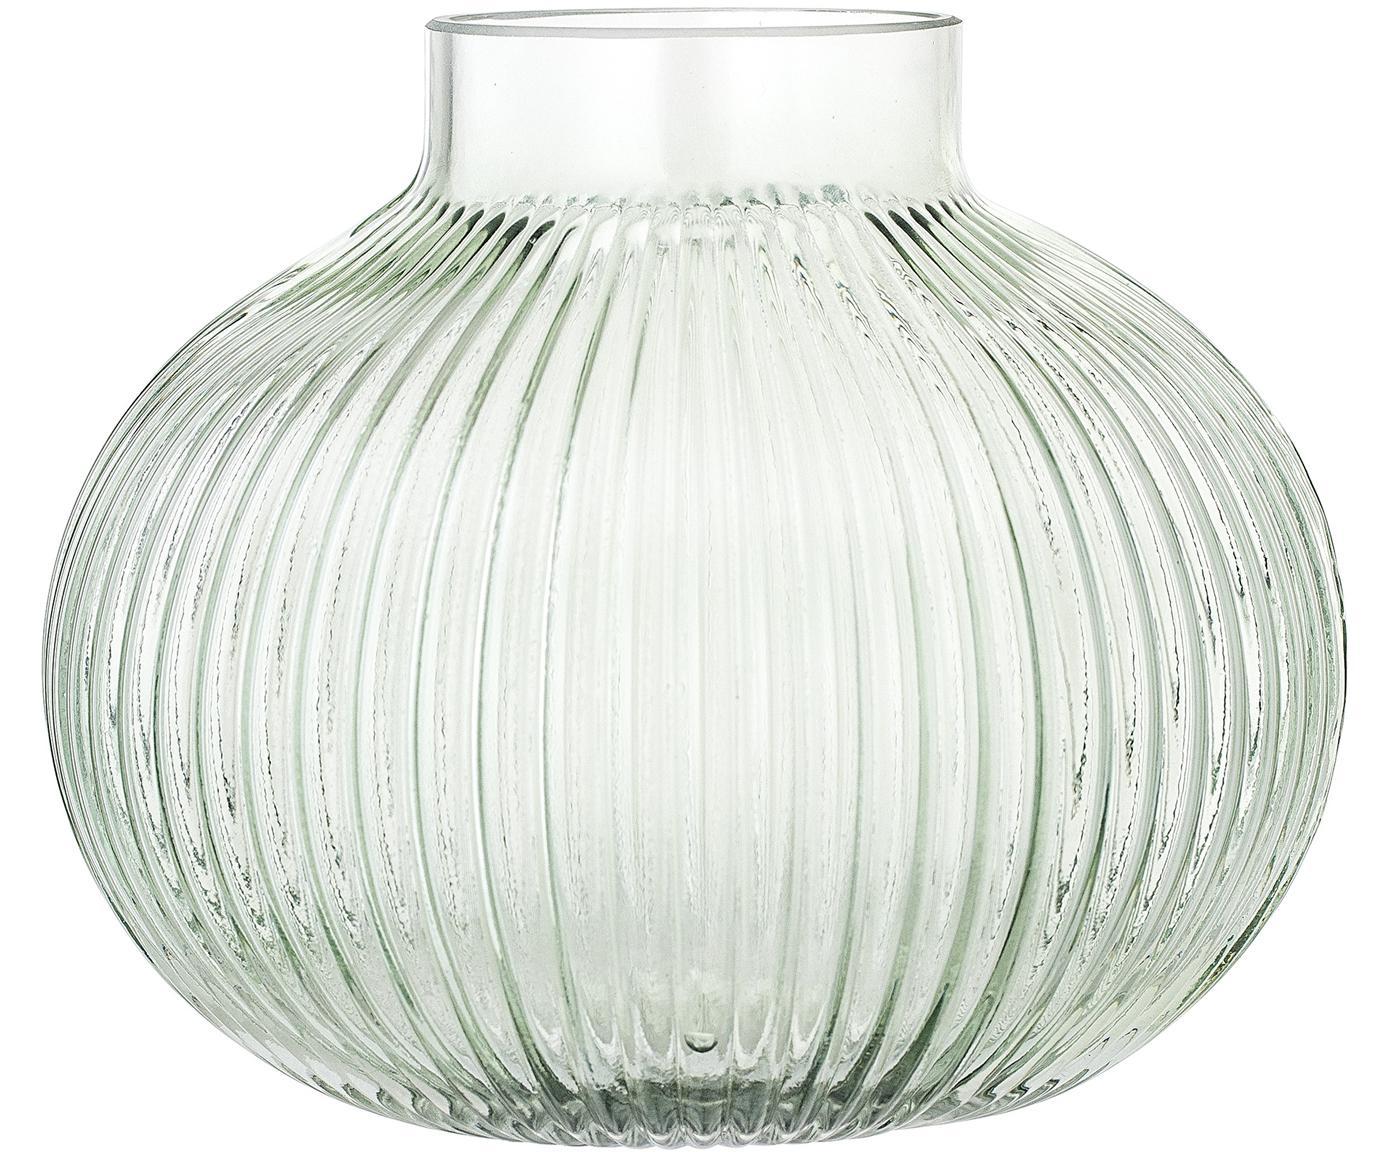 Vaas Gola, Glas, Lichtgroen, transparant, Ø 16 x H 15 cm